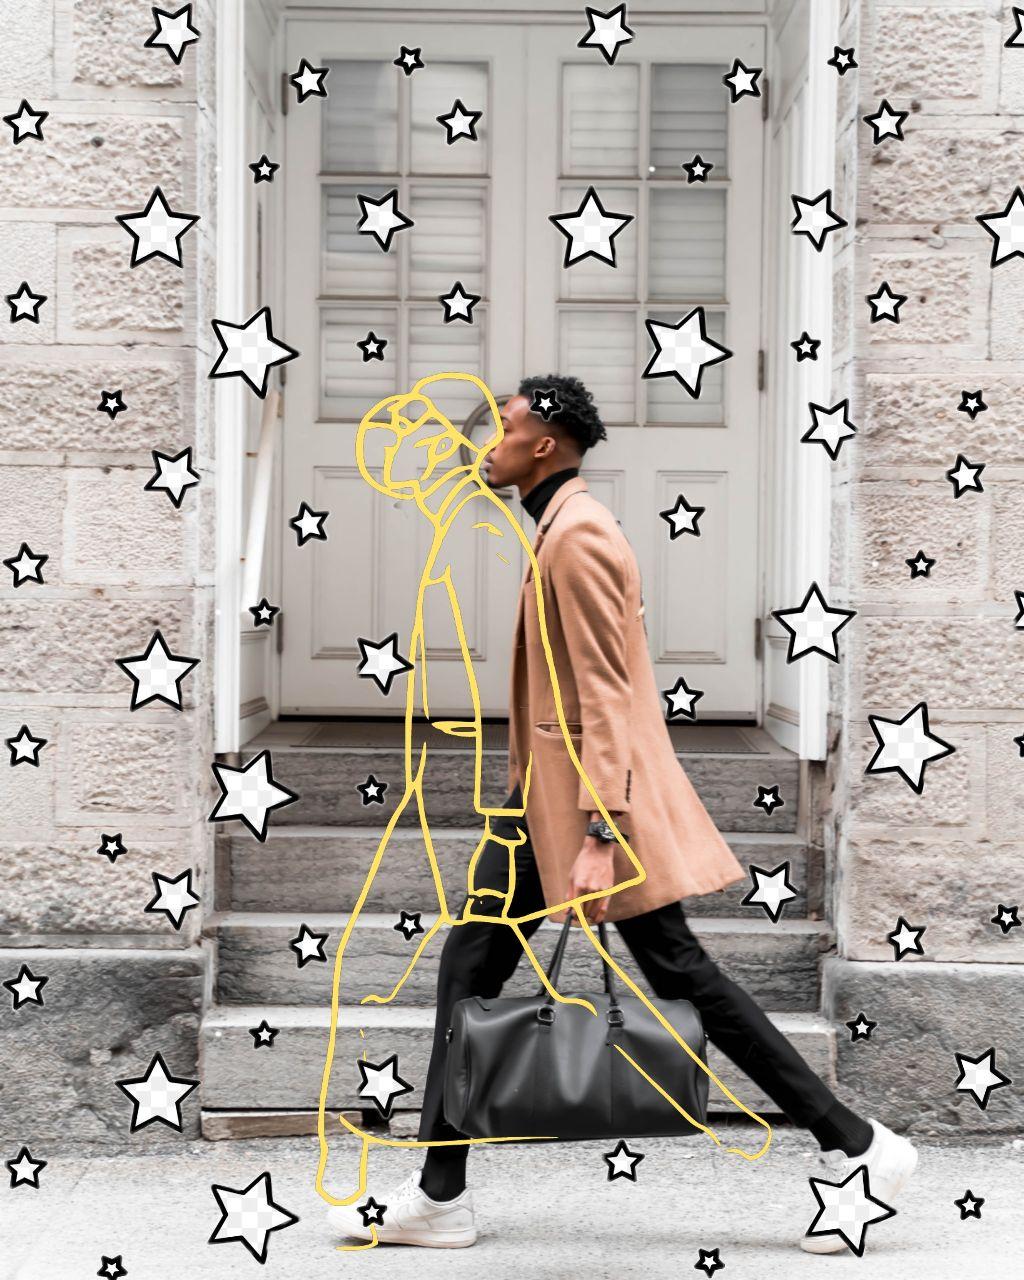 #freetoedit #star #sketch